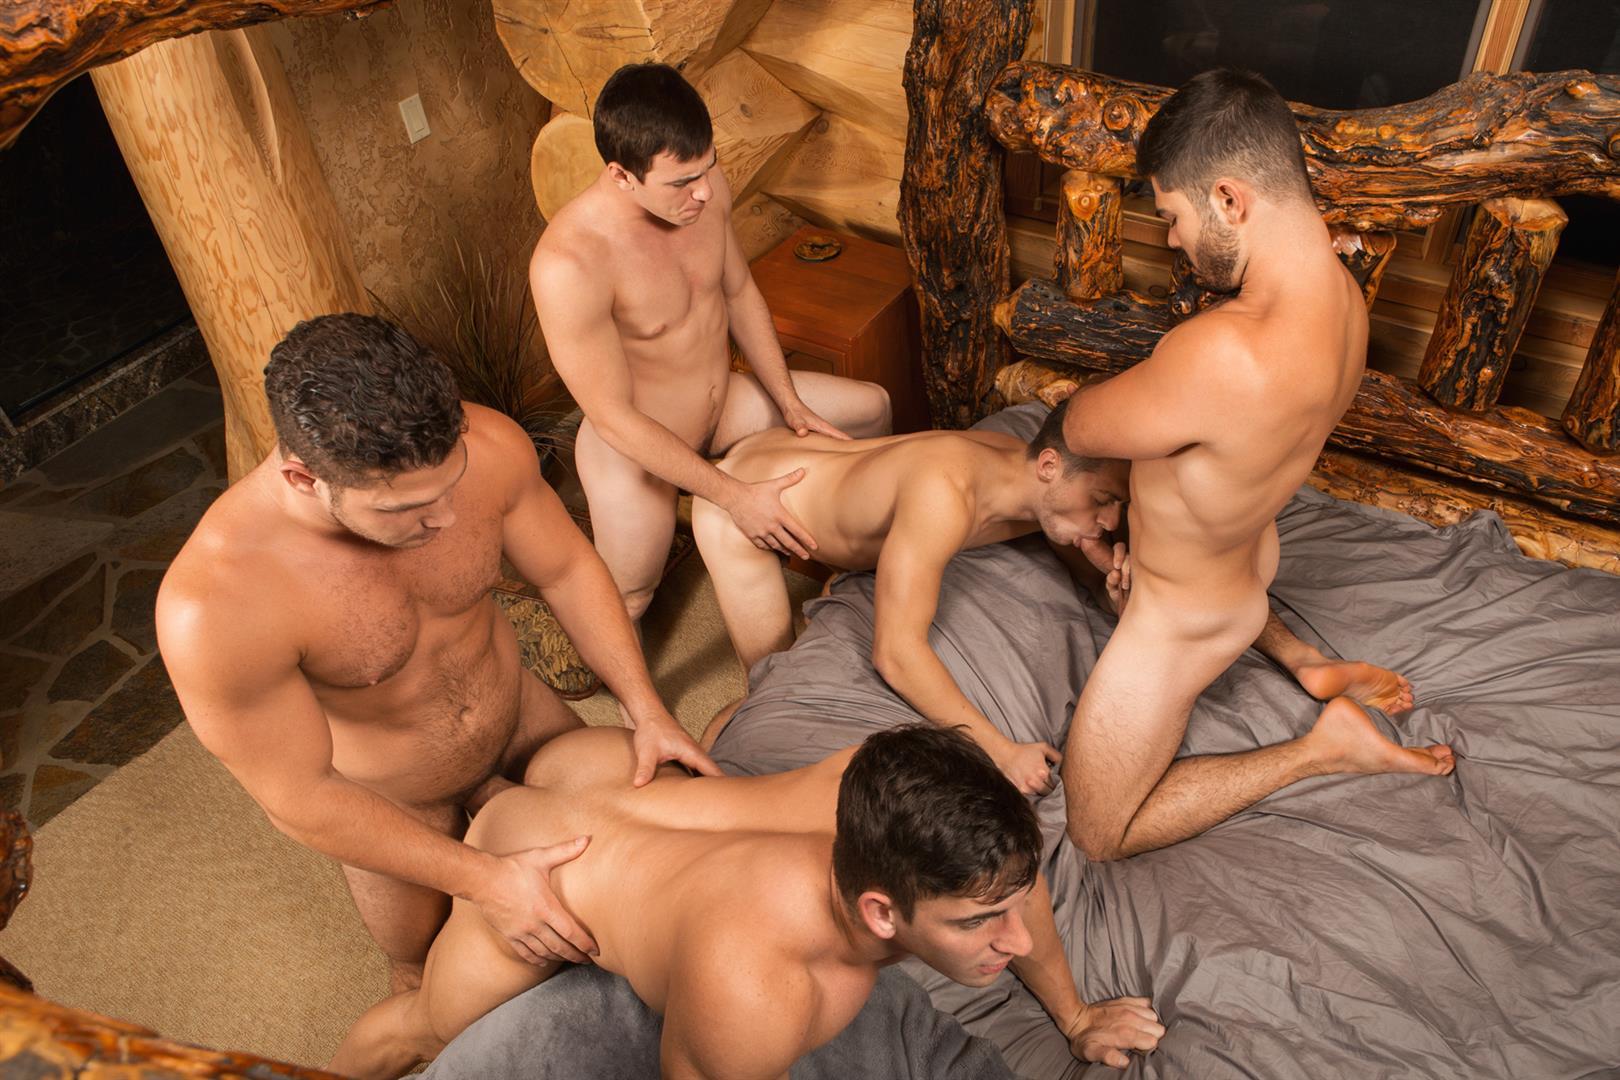 Sean-Cody-Winter-Getaway-Day-1-Big-Dick-Hunks-Fucking-Bareback-Amateur-Gay-Porn-12 Sean Cody Takes The Boys On A 8-Day Bareback Winter Getaway